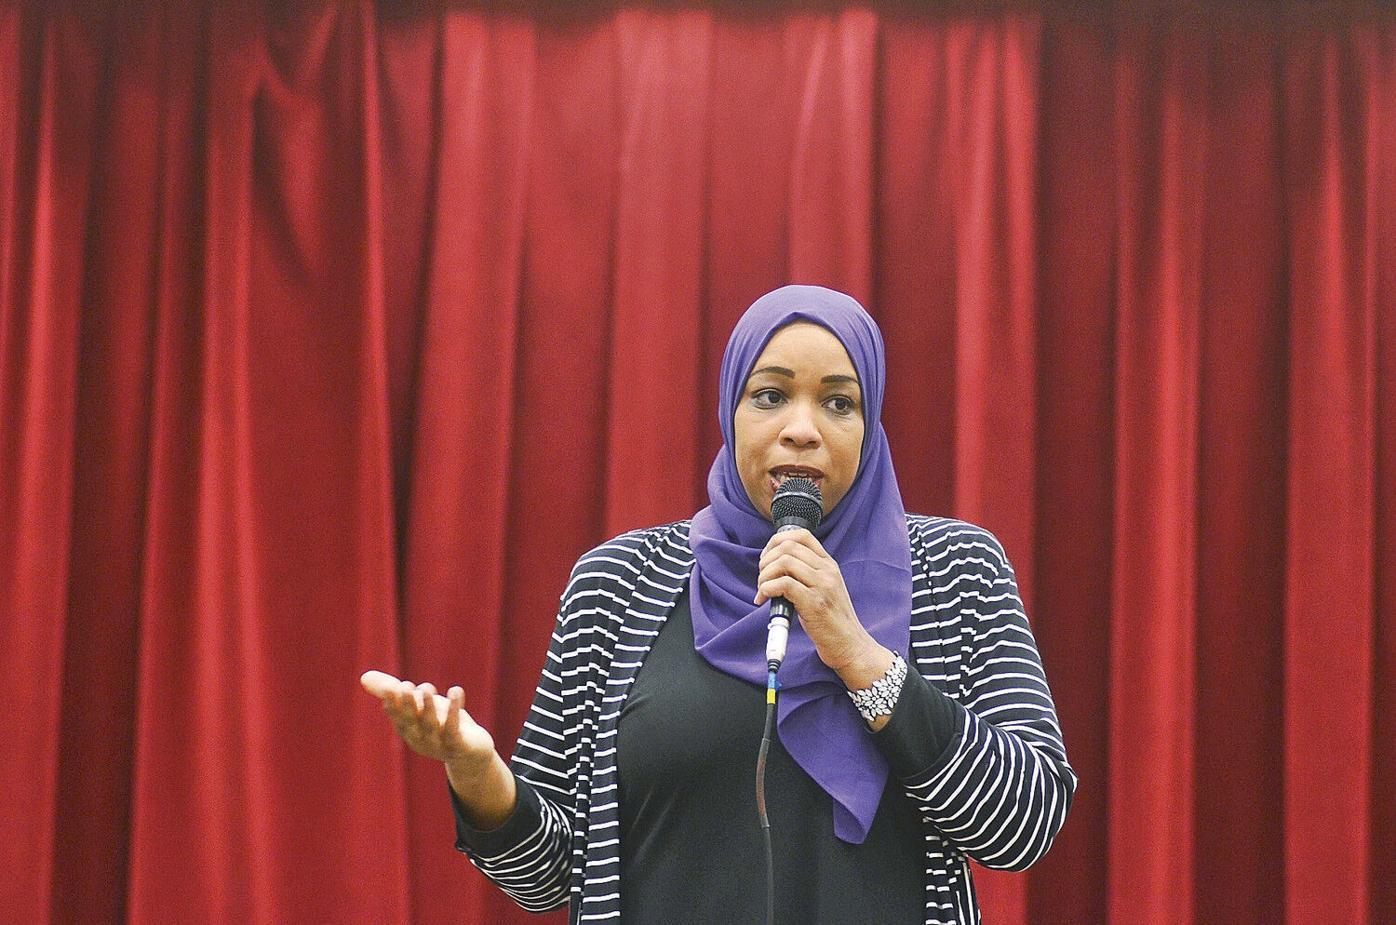 Congressional hopeful Amatul-Wadud says 'status quo is failing people'